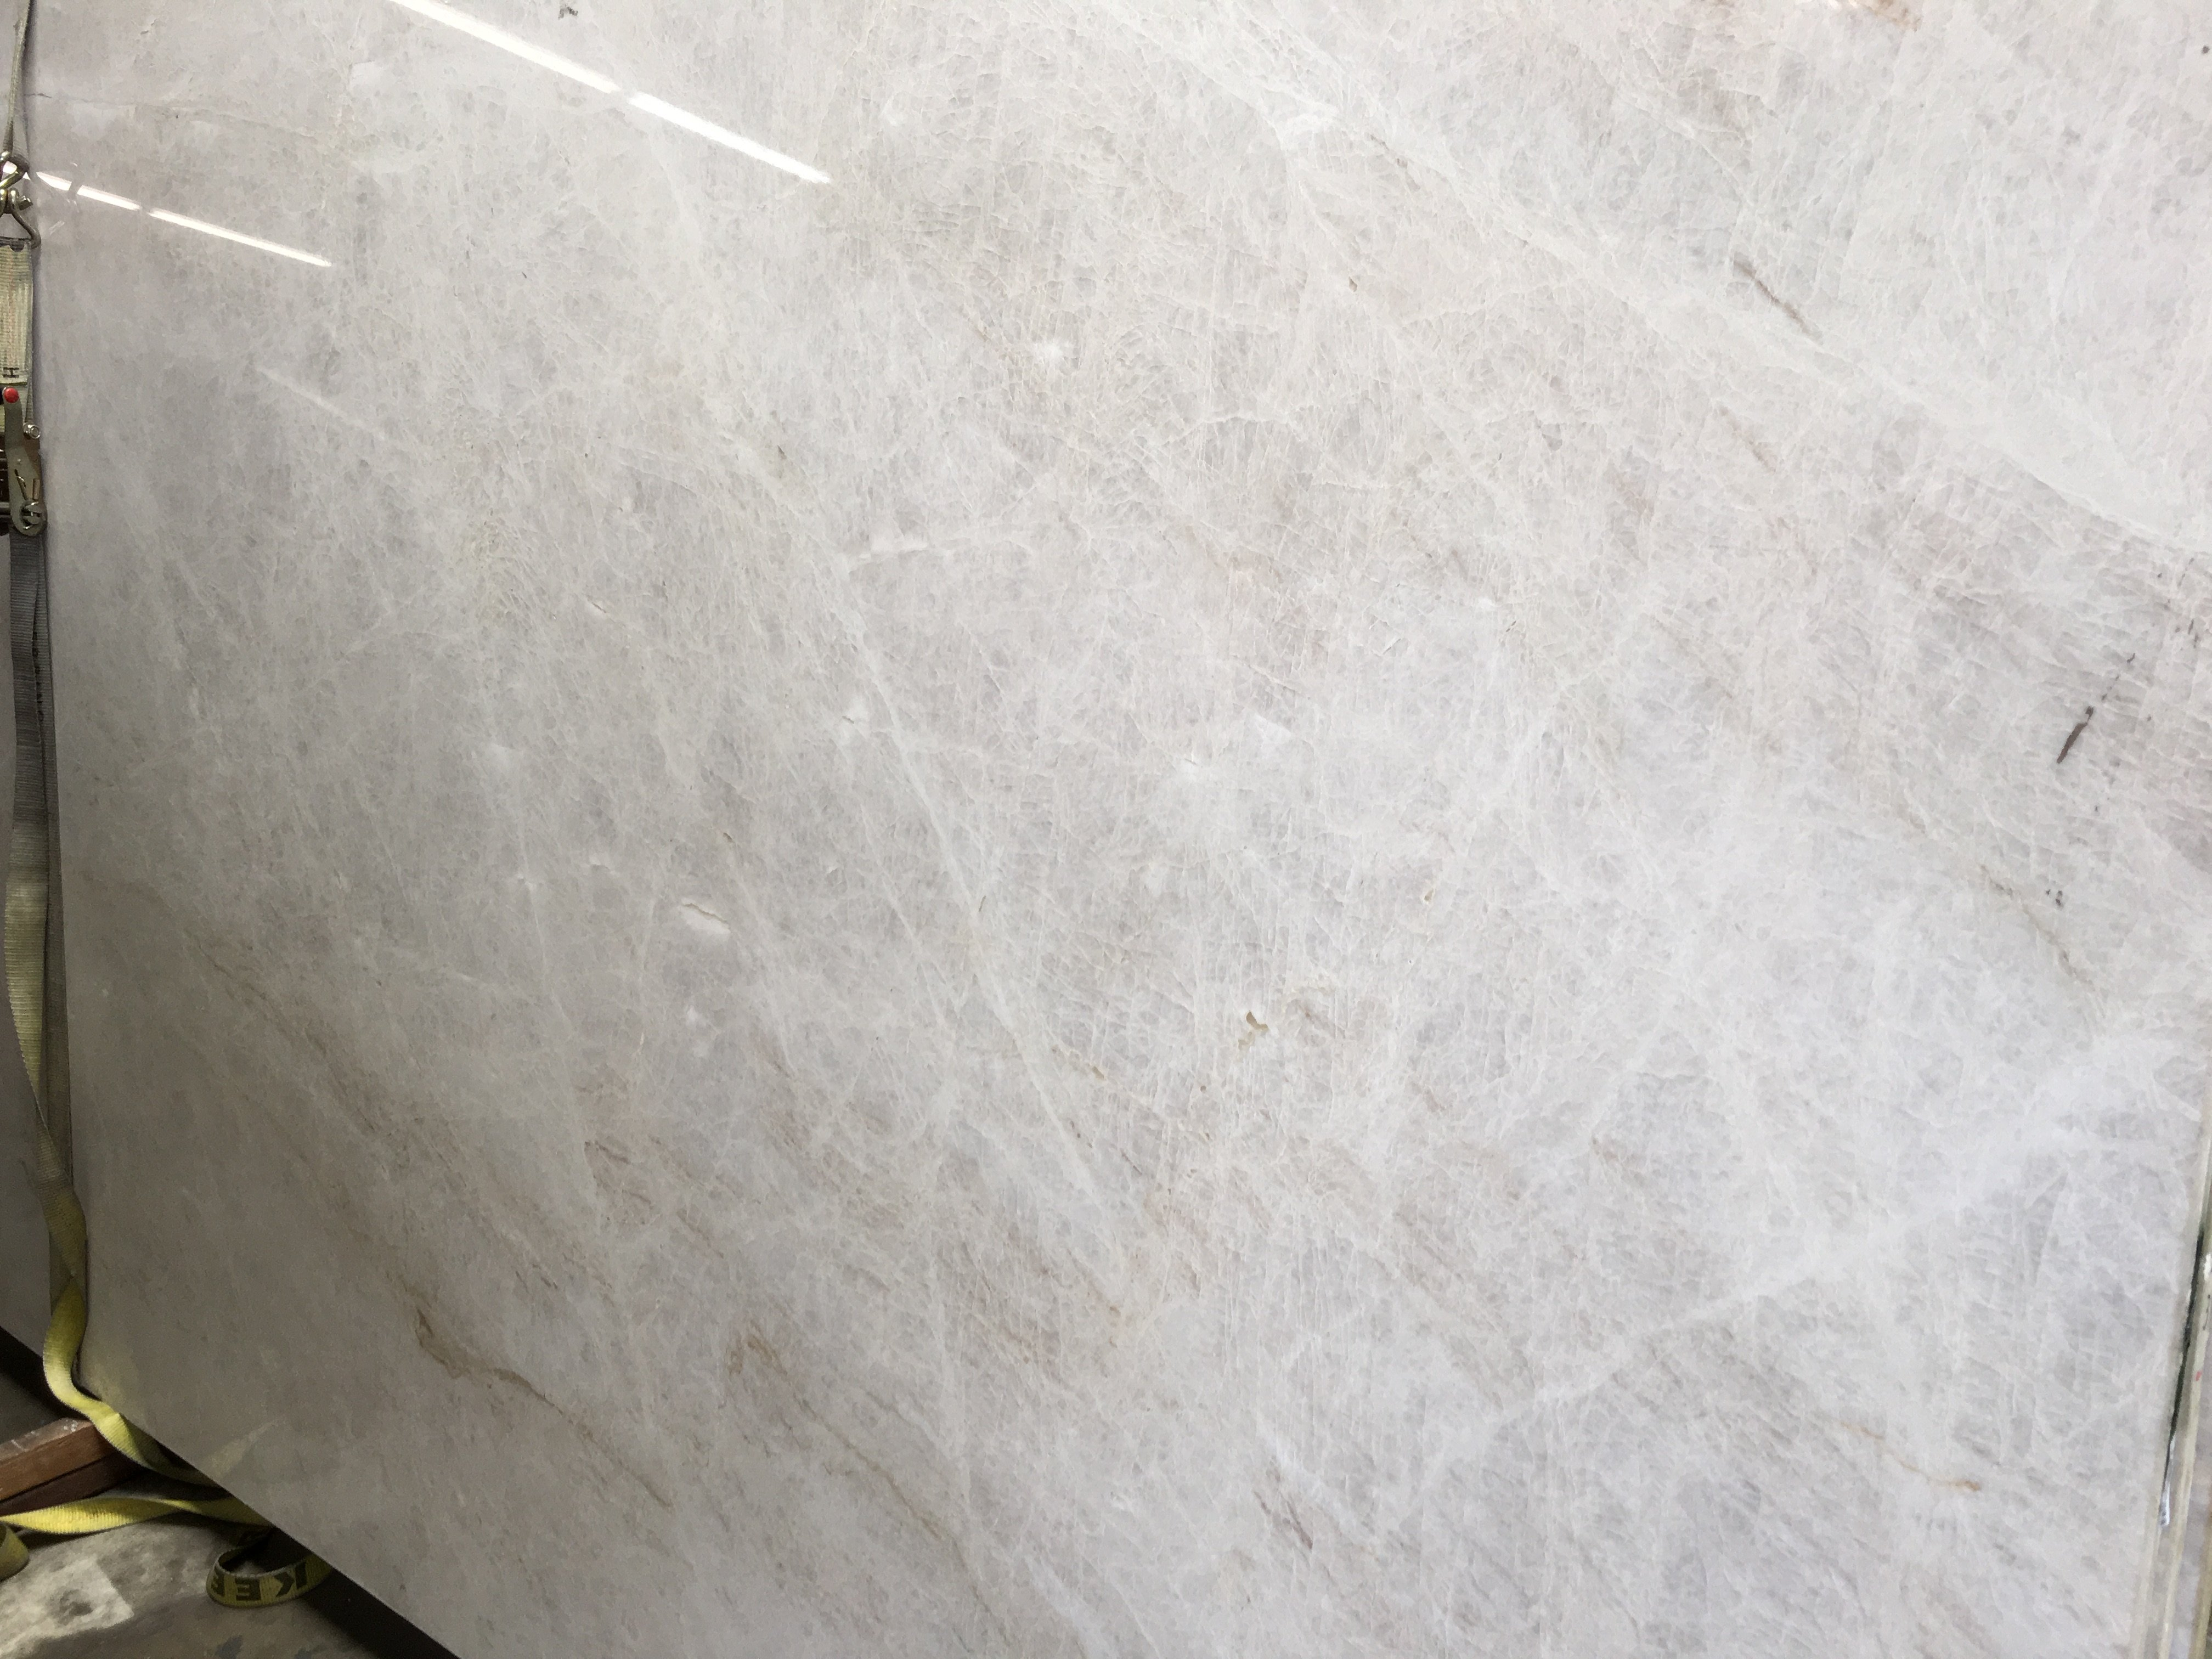 The Kitchen Collection Inc Perla Venato Polished Quartzite Slab Trendy Surfaces